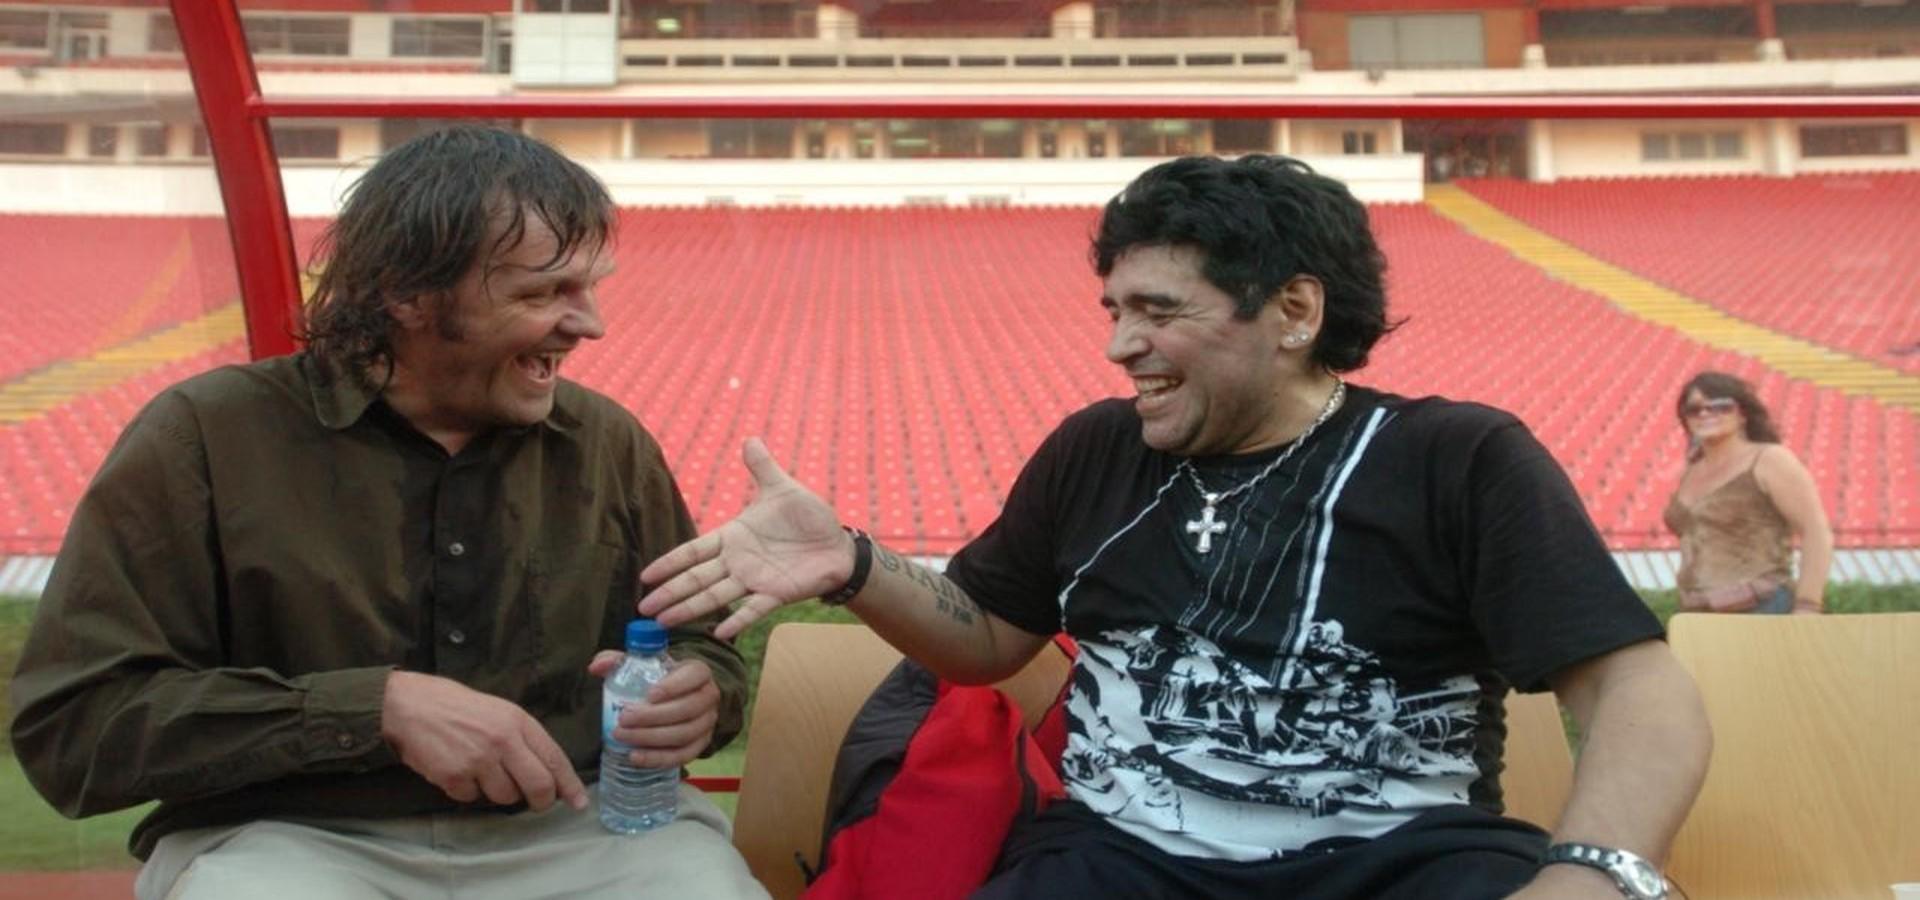 Maradona Di Kusturica Film Guarda Streaming Online